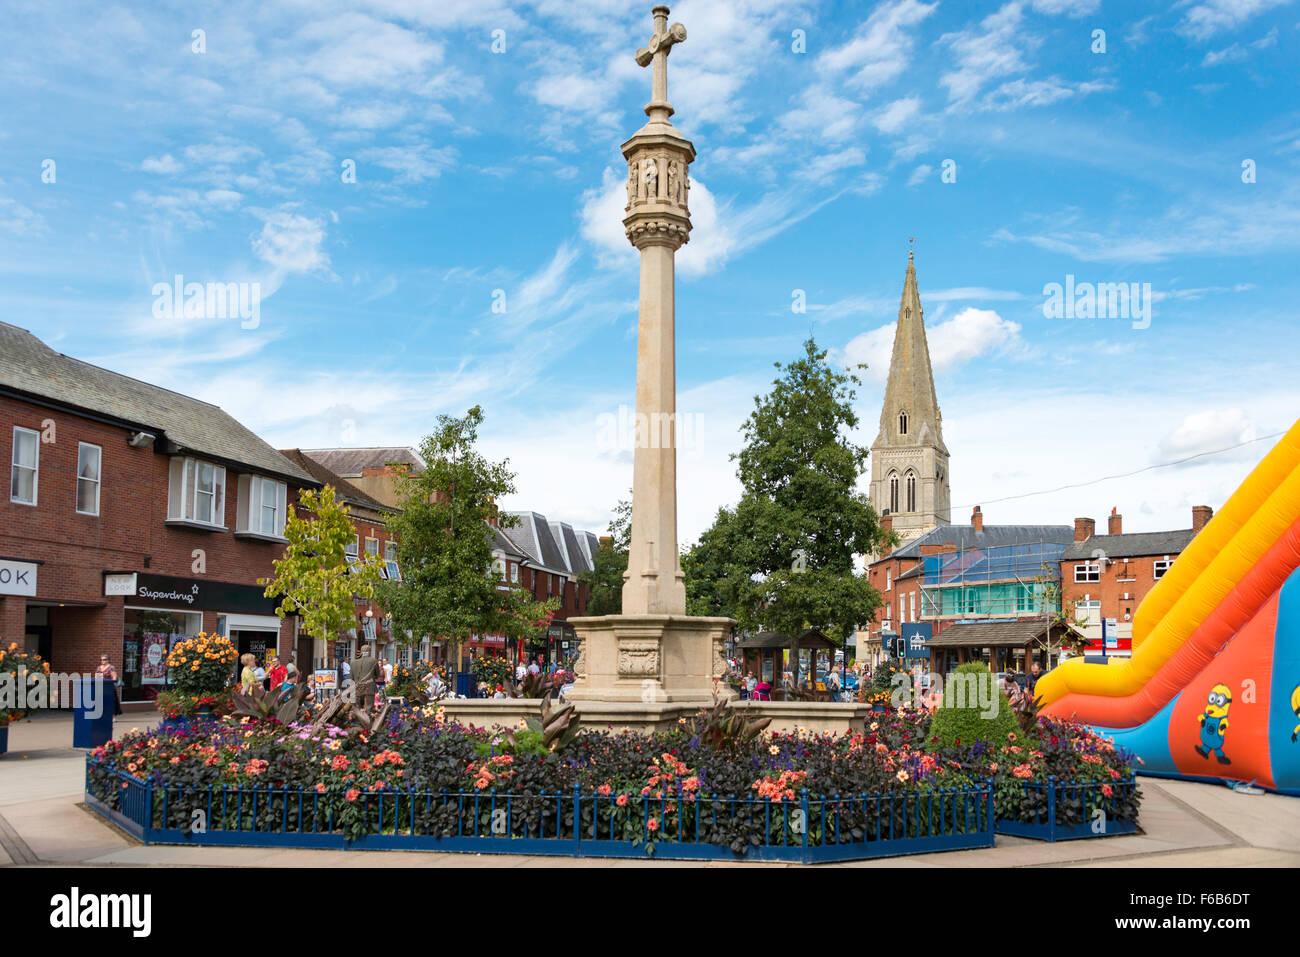 The Square, Market Harborough, Leicestershire, England, United Kingdom - Stock Image